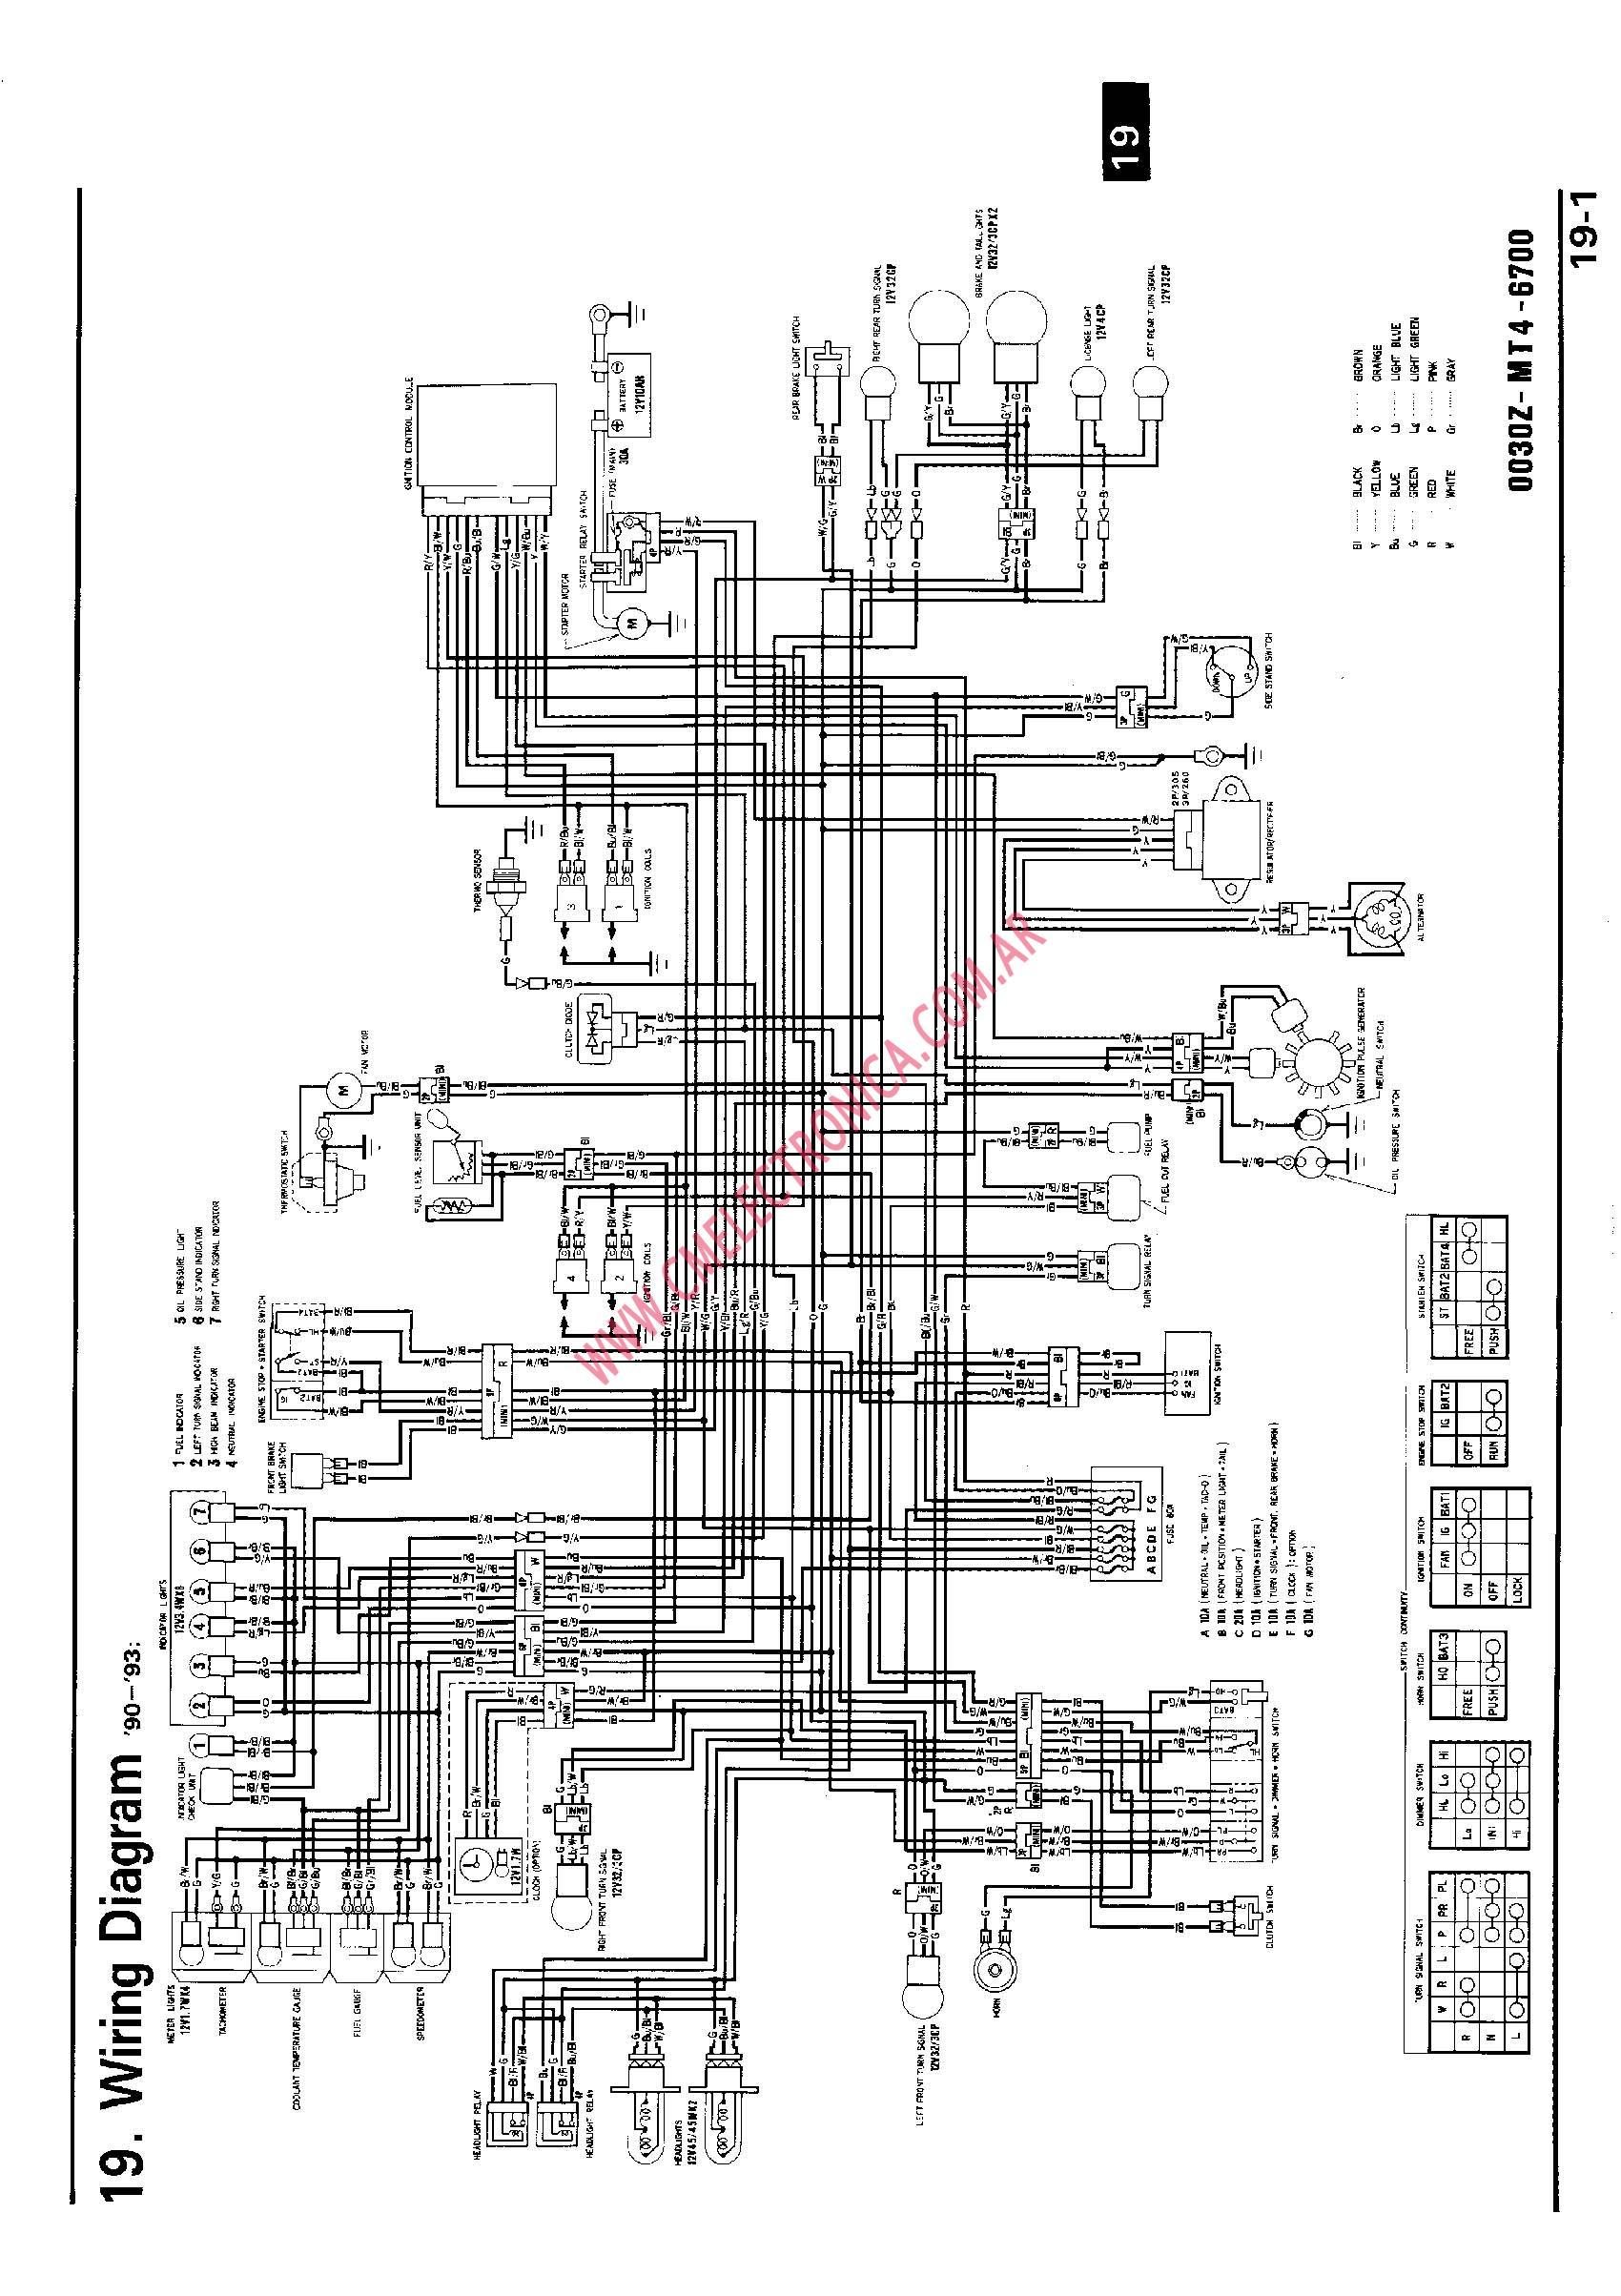 honda vfr750?resize\\\\\\\\\=665%2C942 vfr interceptor wiring diagrams wiring diagrams Basic Electrical Schematic Diagrams at soozxer.org